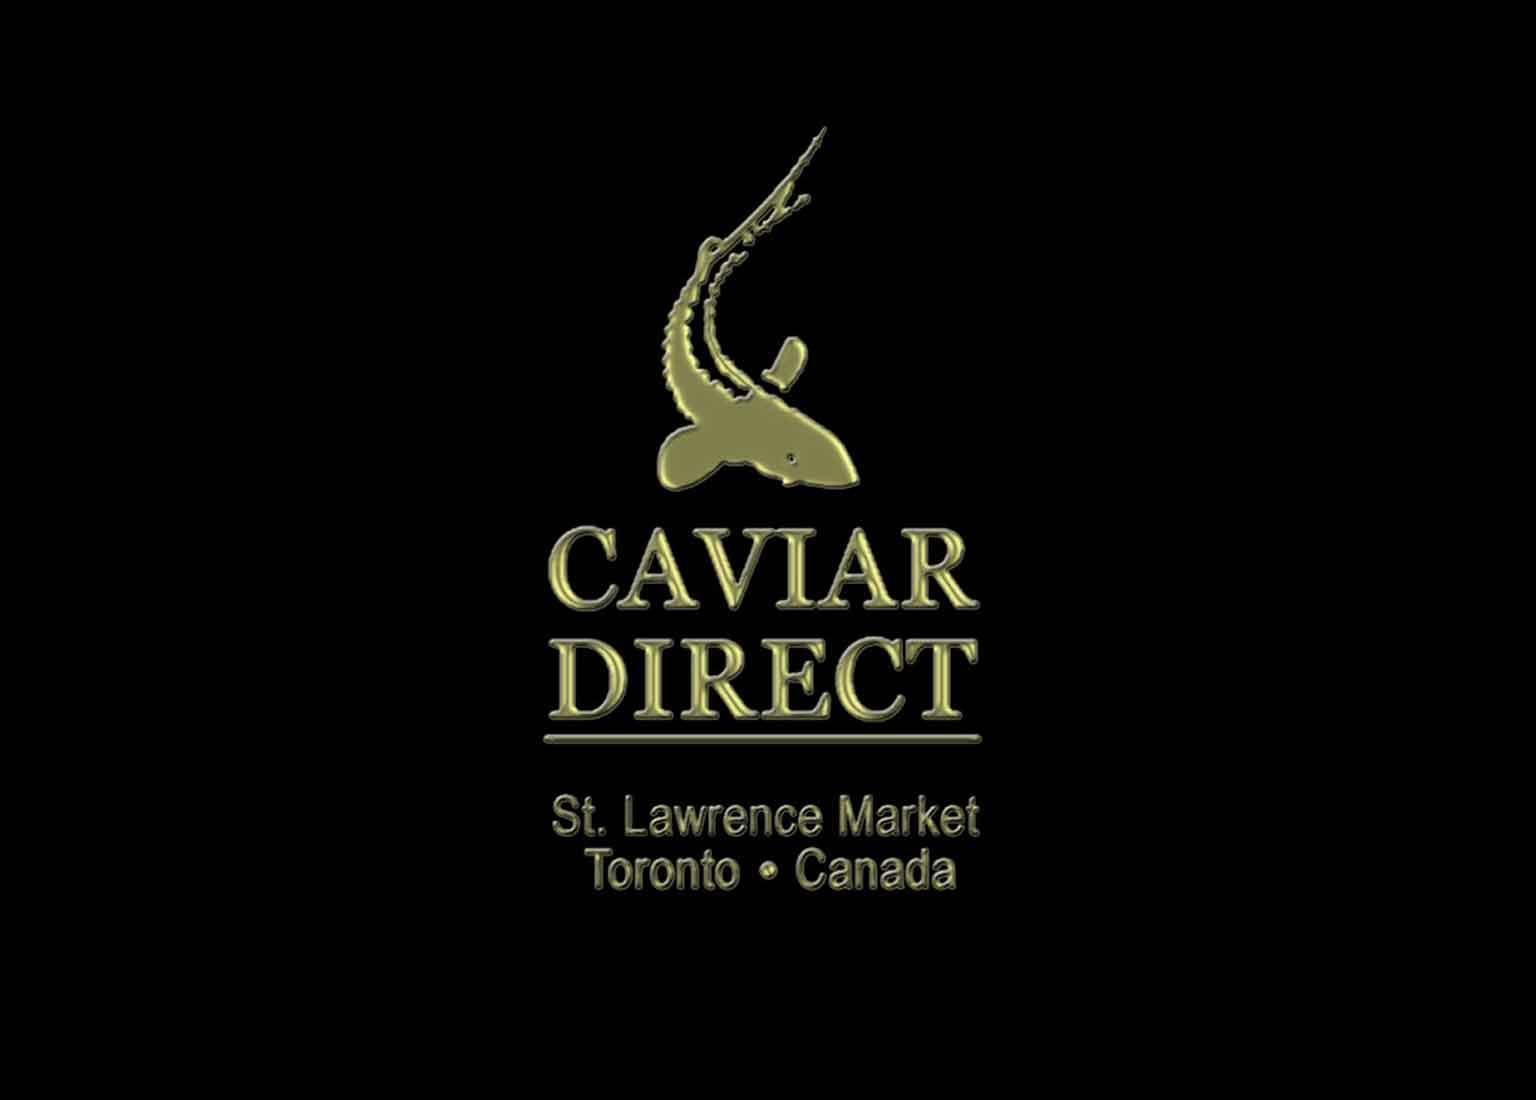 Caviar Direct